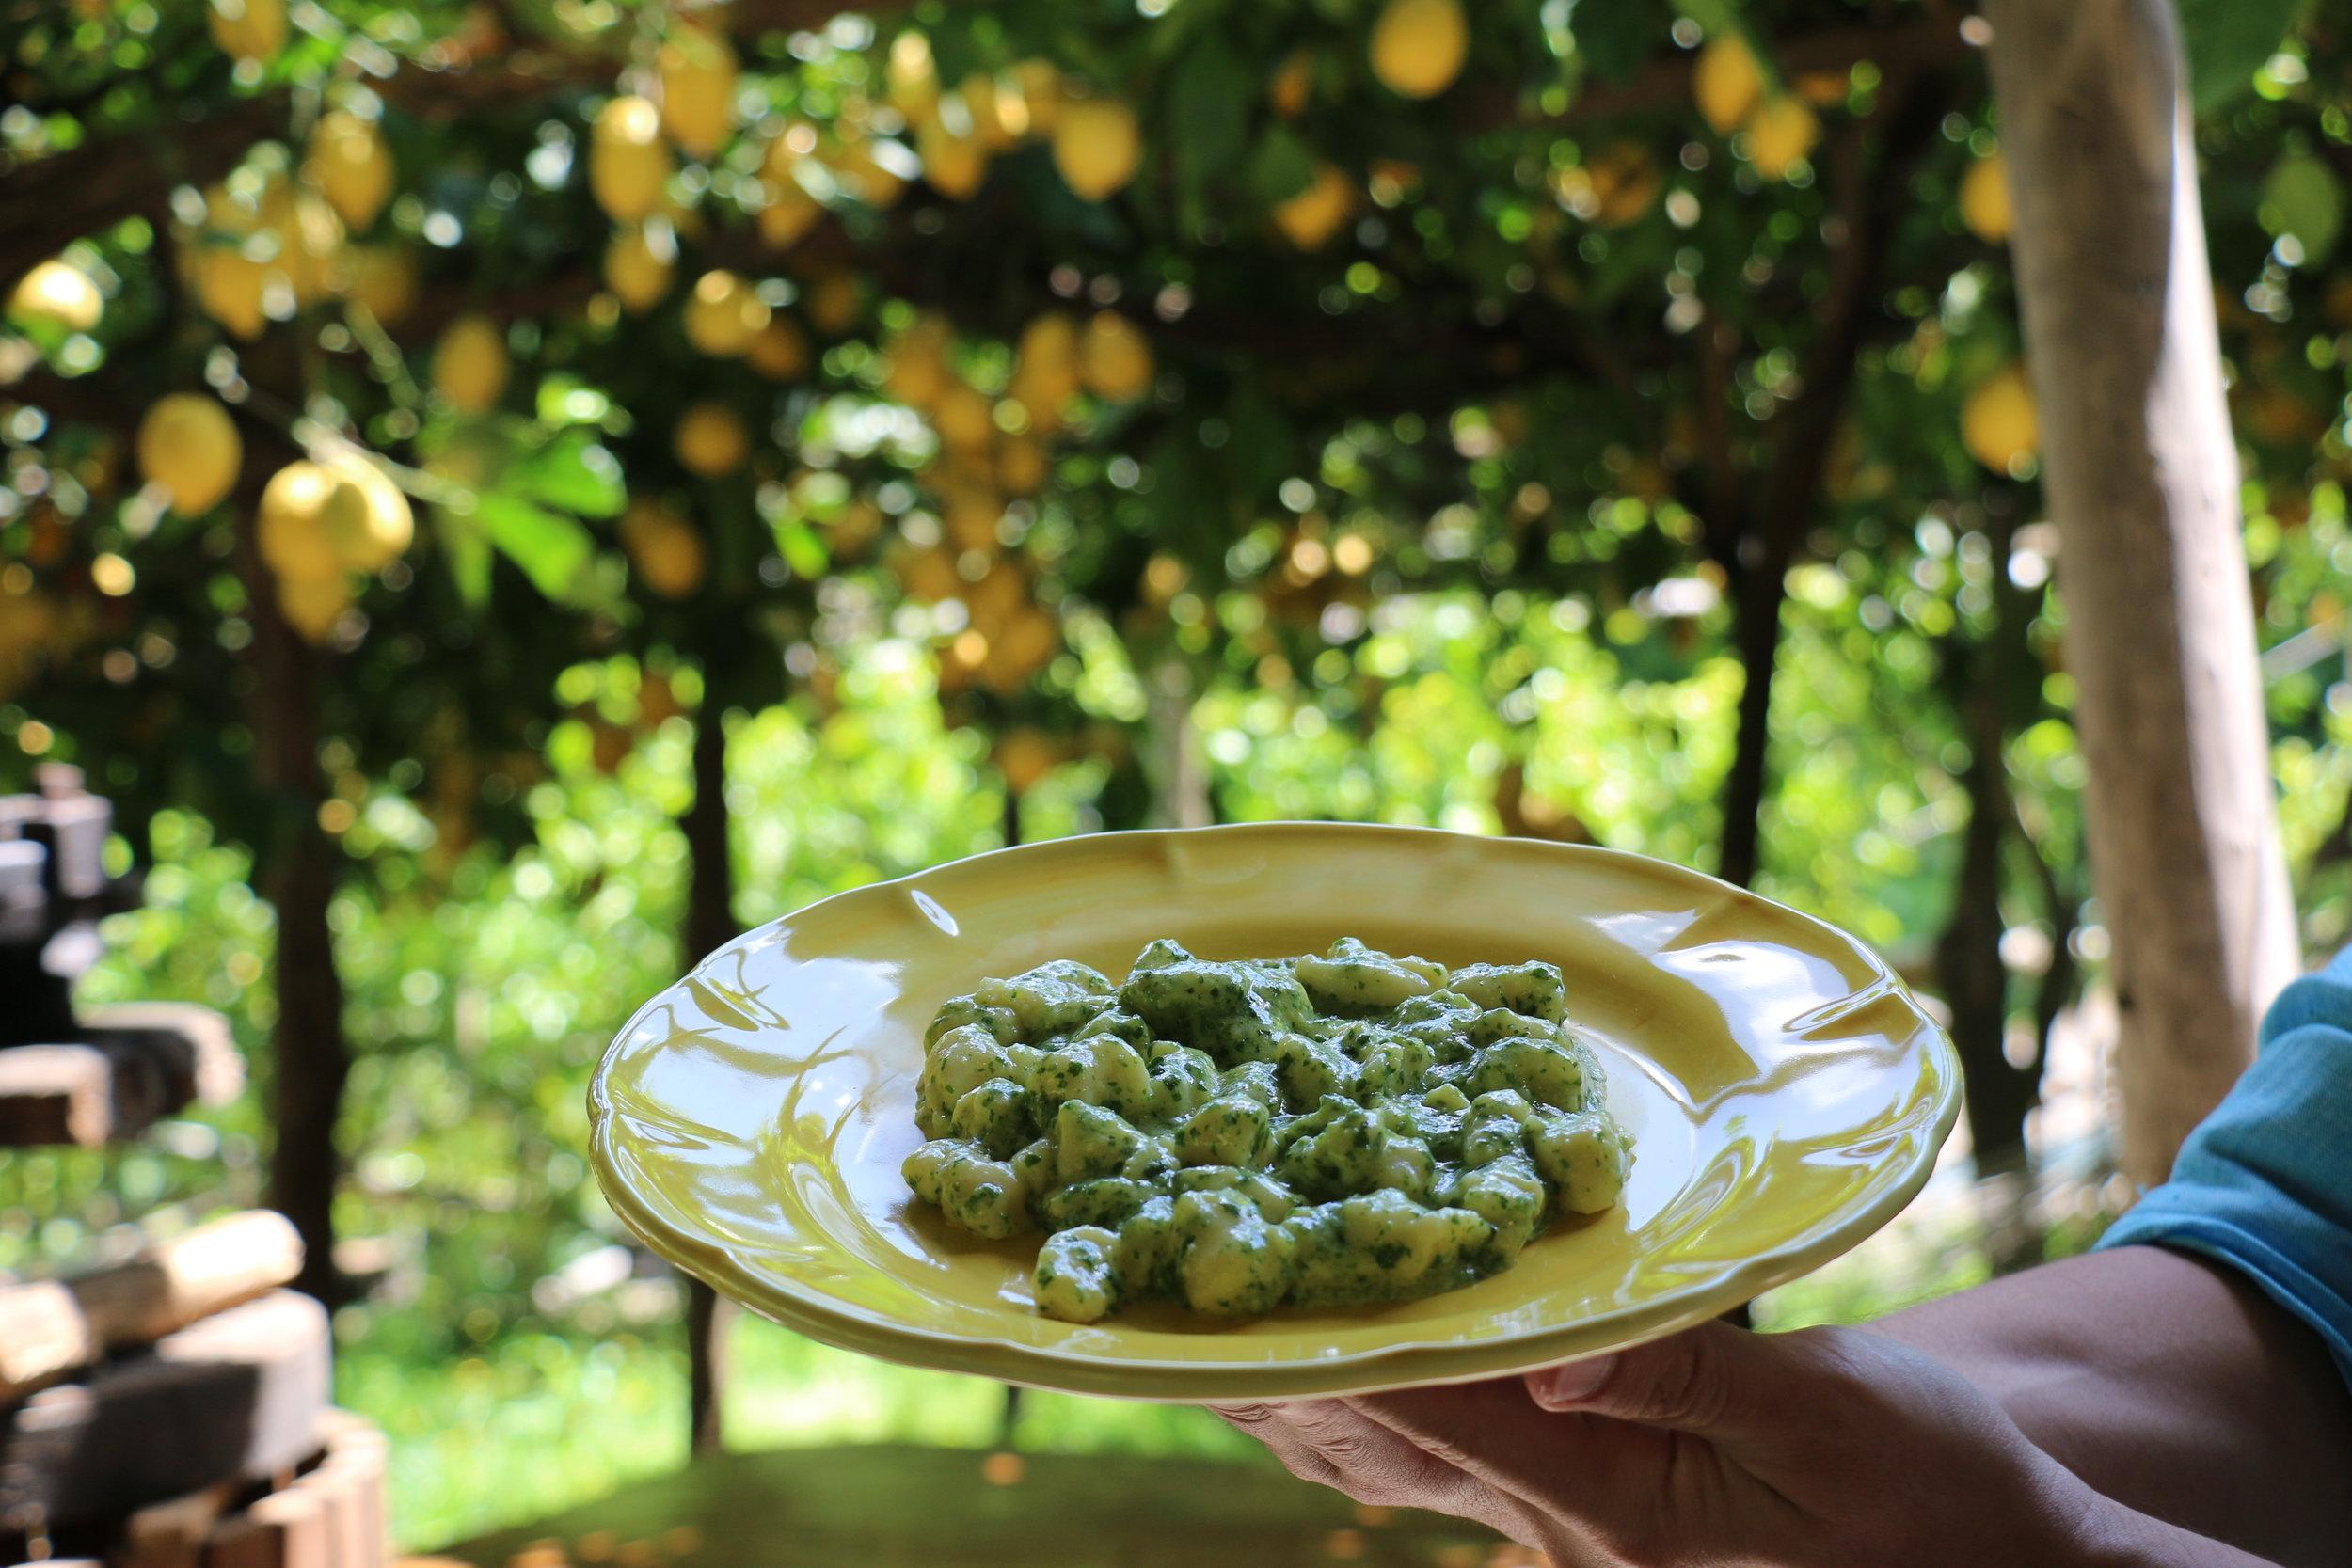 Our 3rd dish: Handmade Lemon Gnocchi tossed in fresh made pesto